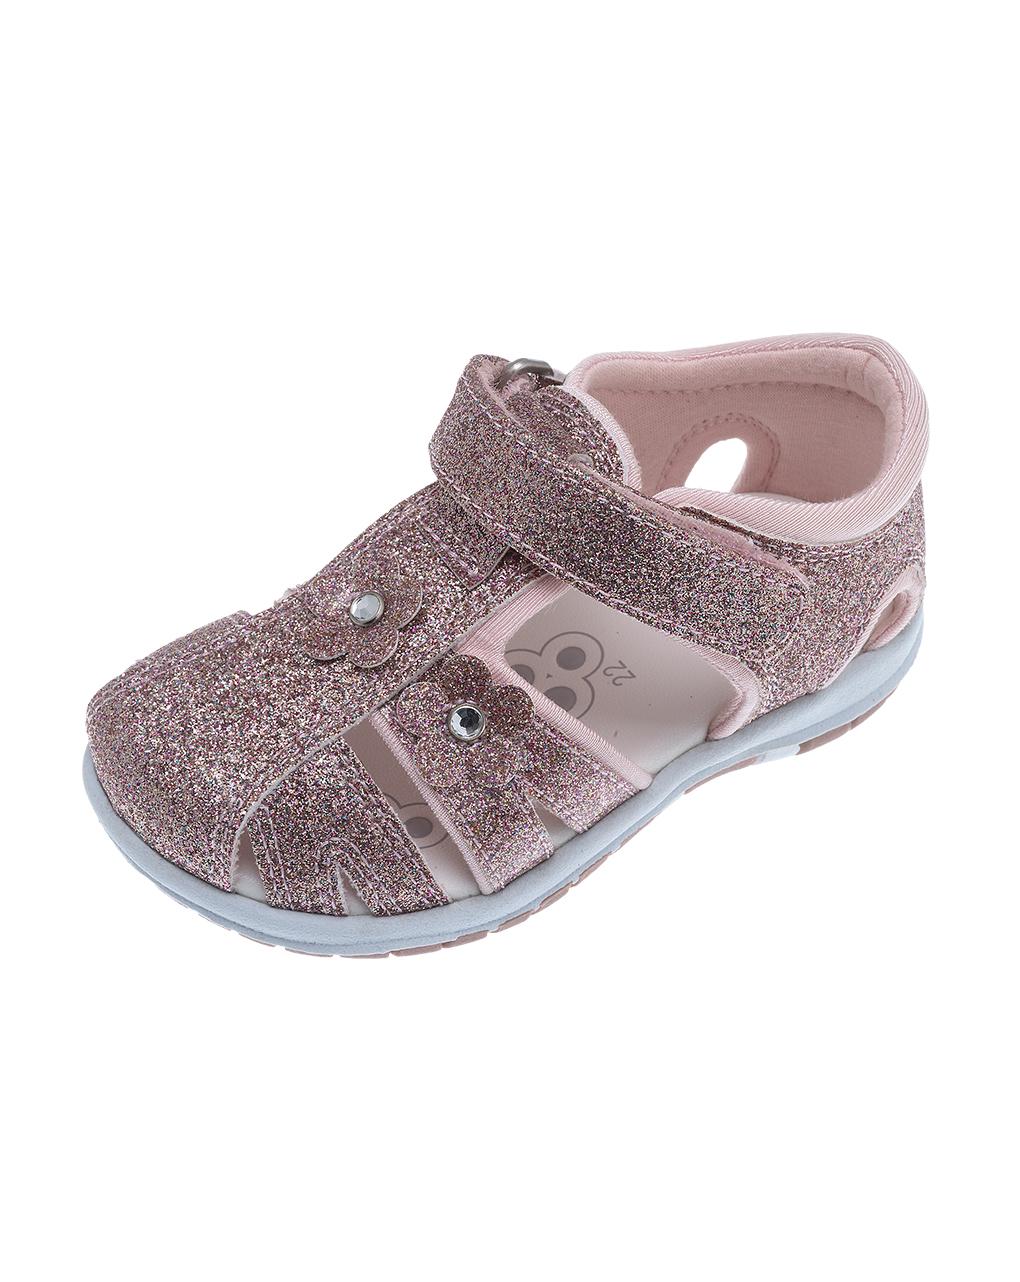 Sandalo femmina flora - Chicco